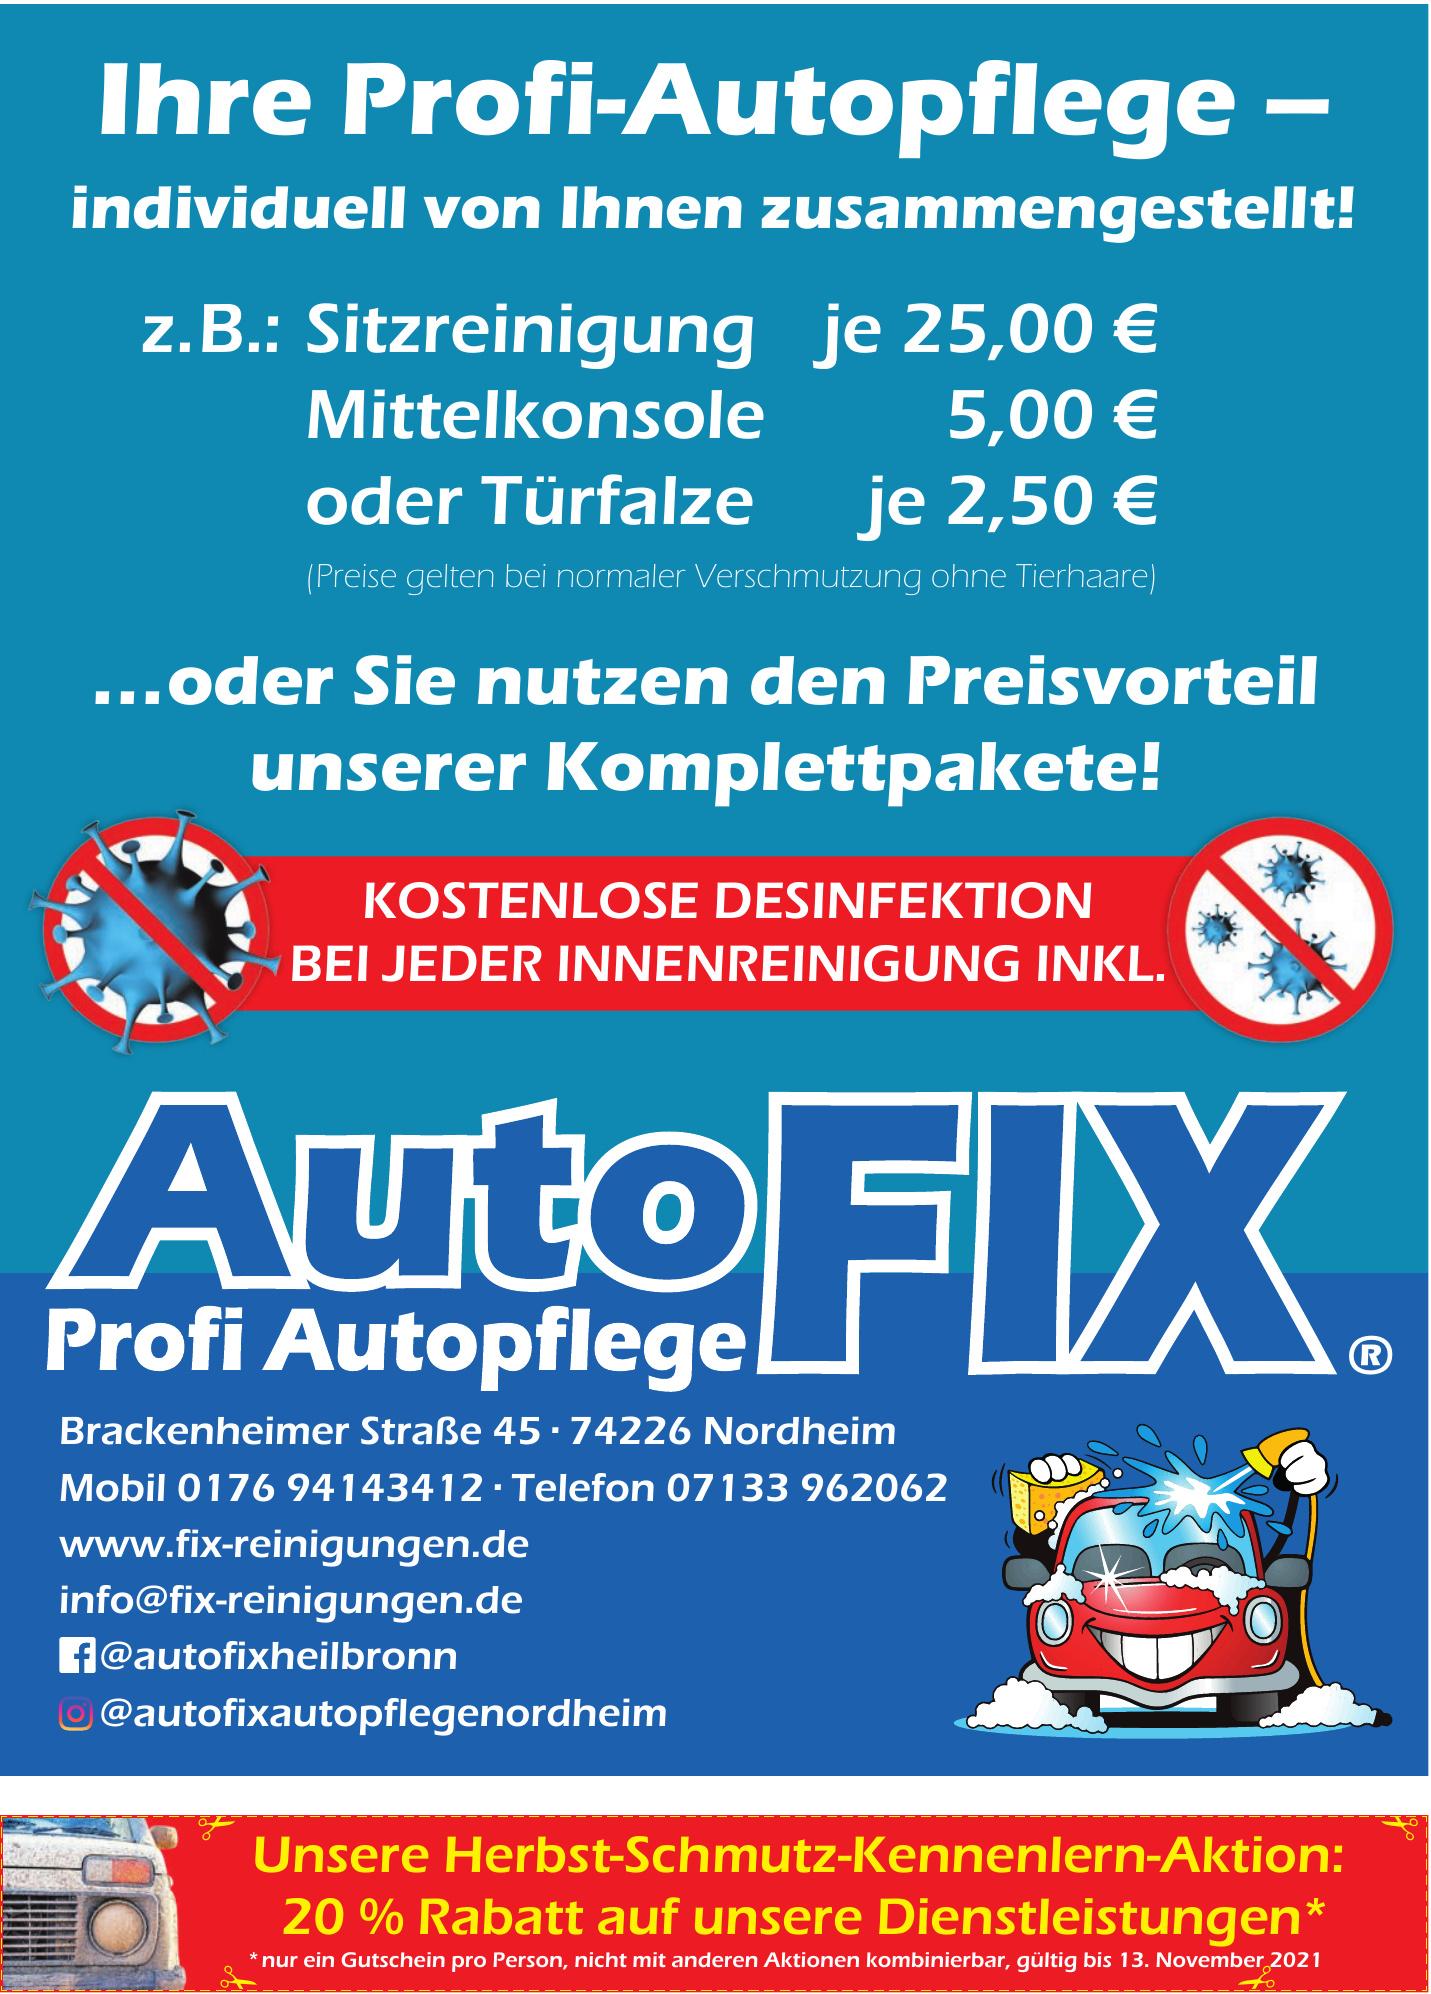 Autofix - Profi Autoplege